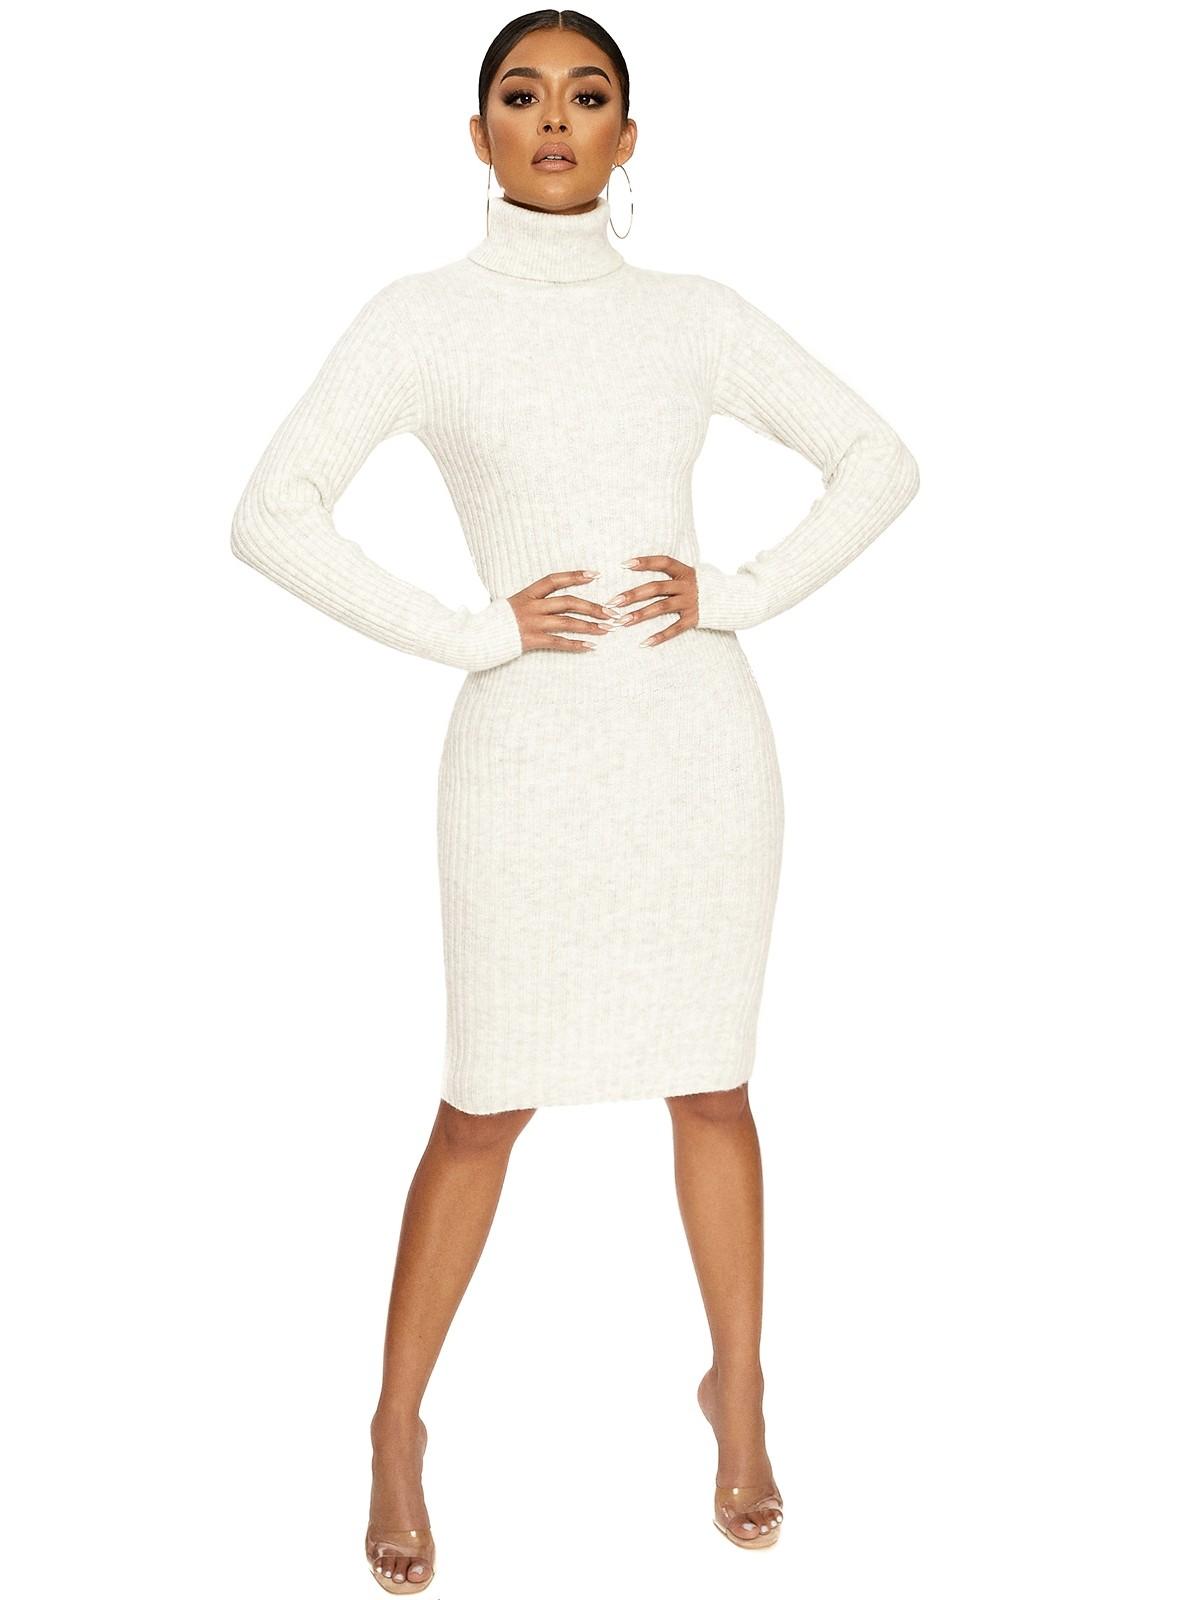 Seein' Knit My Way Ribbed Dress by Naked Wardrobe, available on nakedwardrobe.com for $62 Kylie Jenner Dress SIMILAR PRODUCT